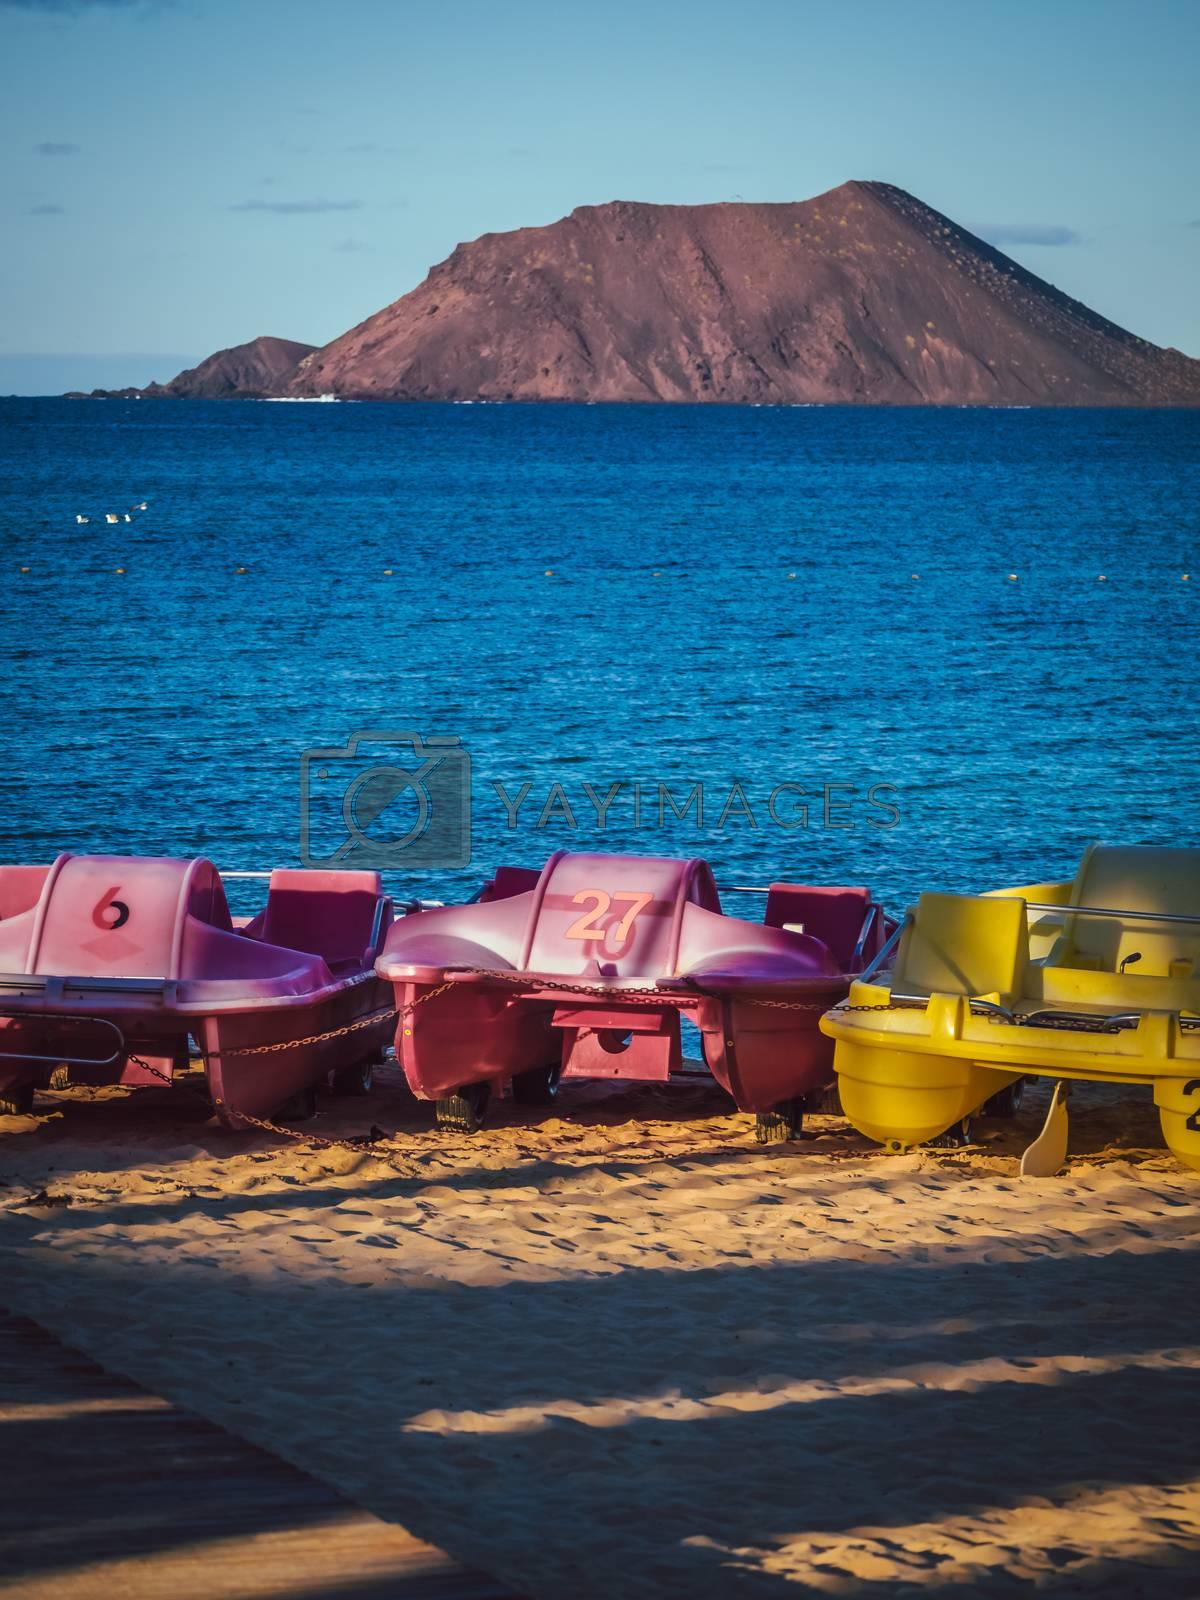 Los Lobos Island as seen from the harbour in Corralejo, Fuerteventura, Canary Island, Spain